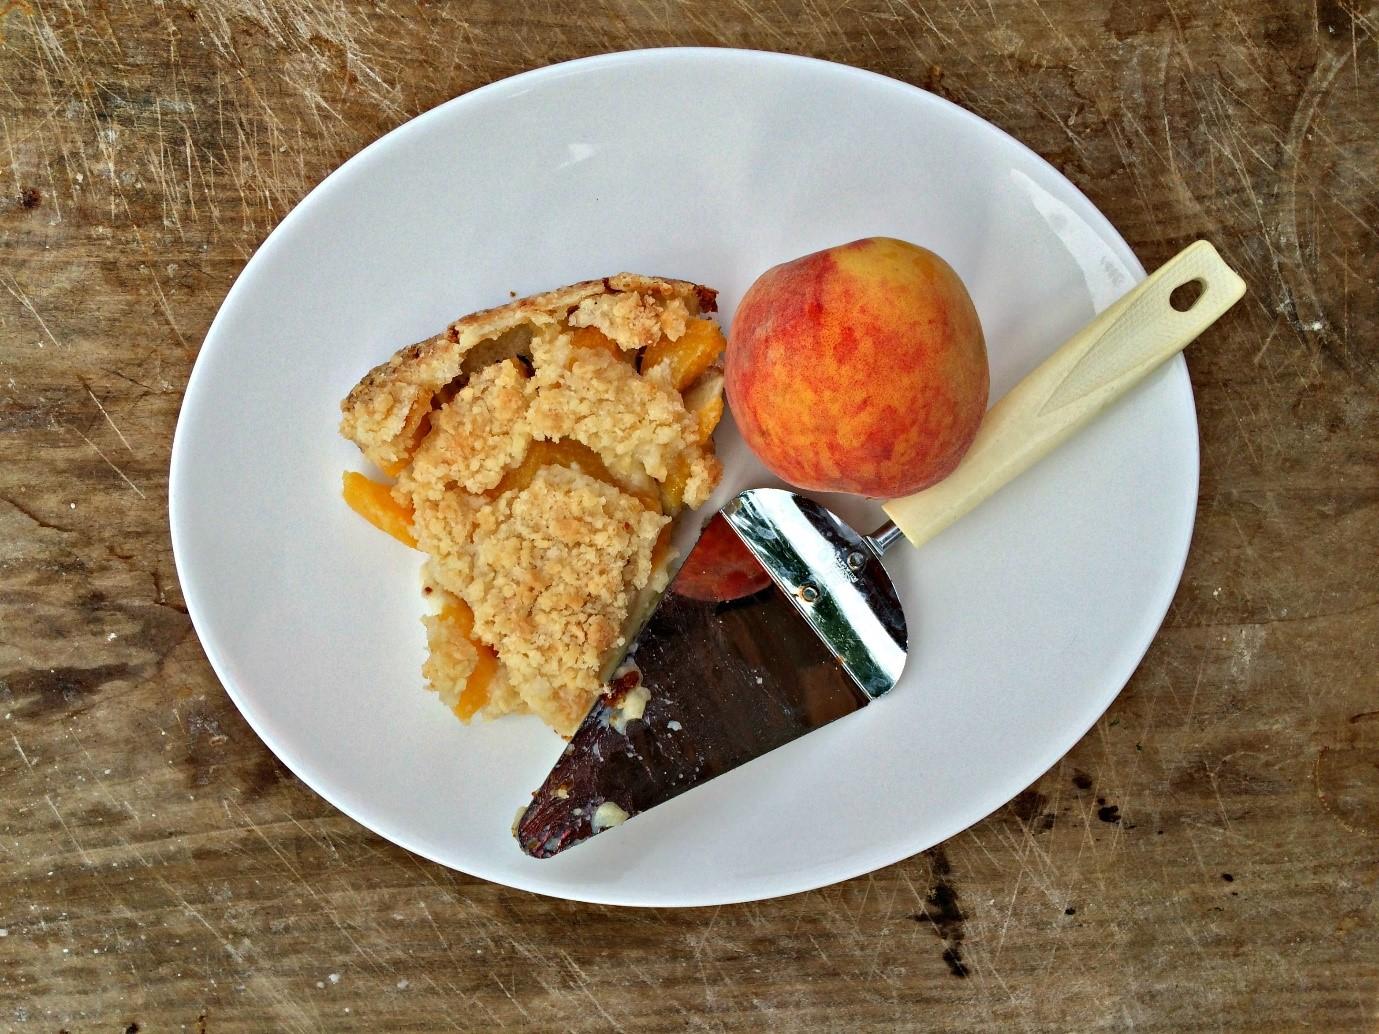 Peaches and Cream Pie with Graham Cracker Crust